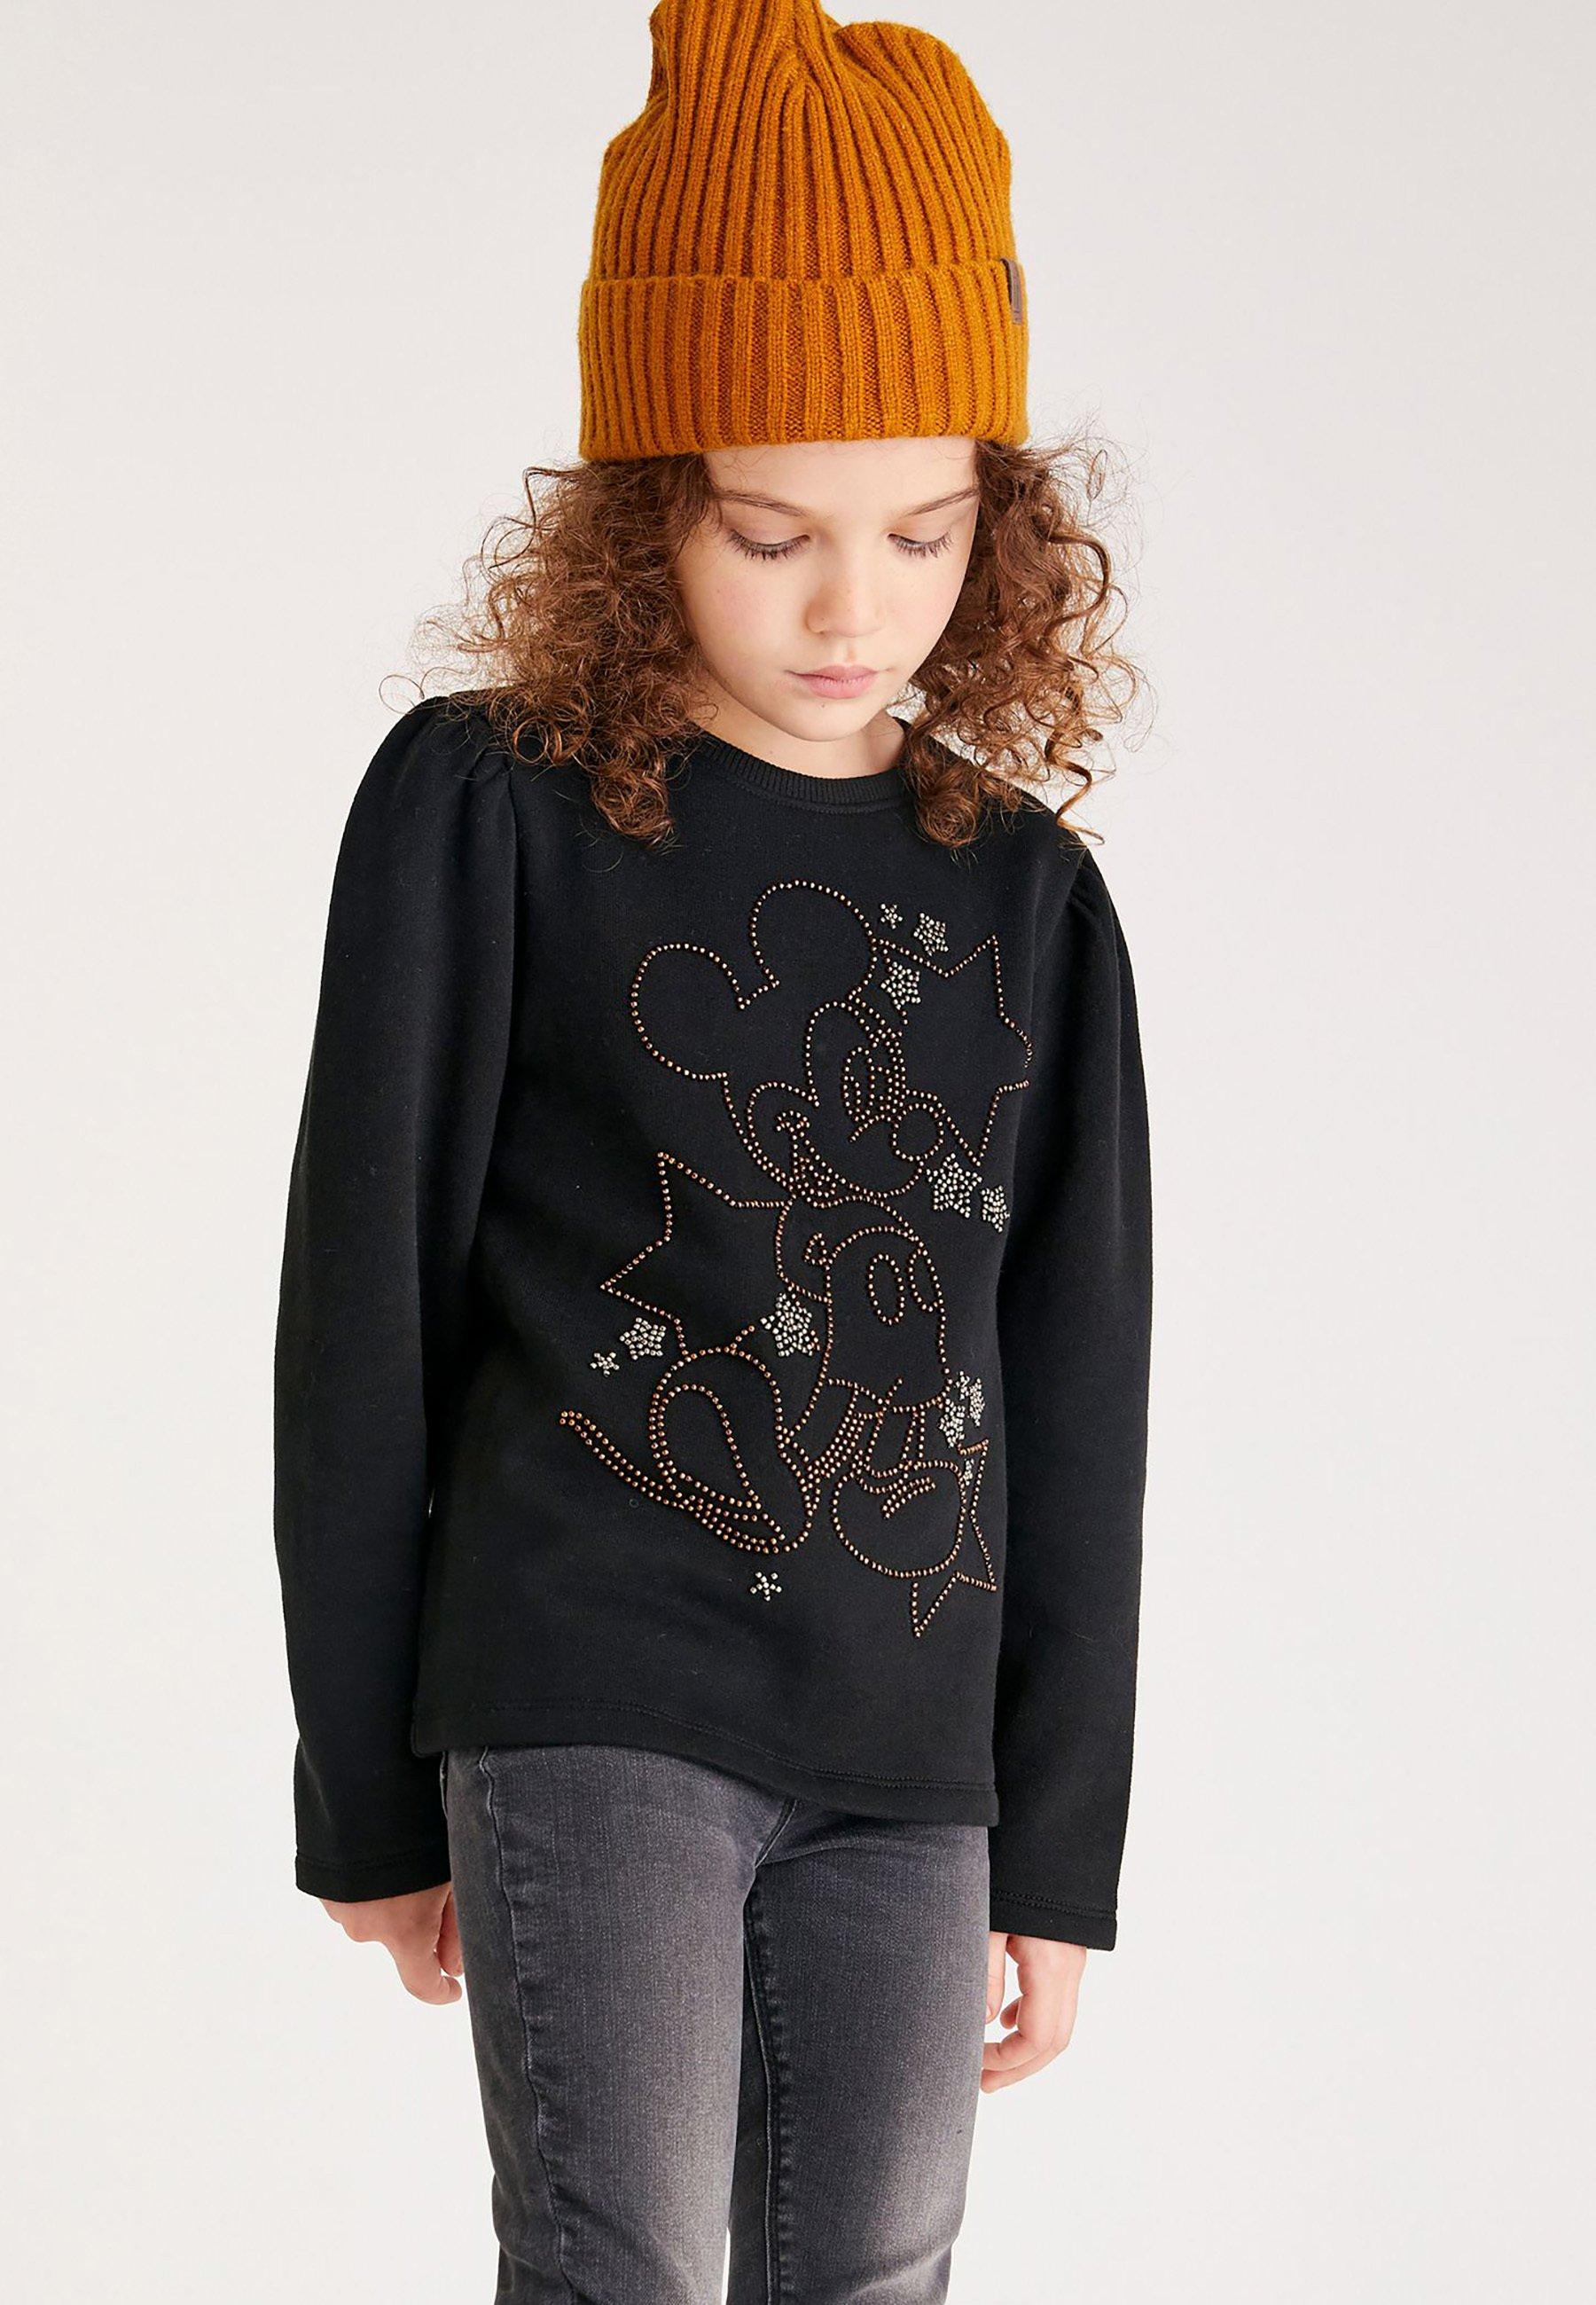 Kinder MICKEY MOUSE PUFF SLEEVE CREW NECK TOP - Langarmshirt